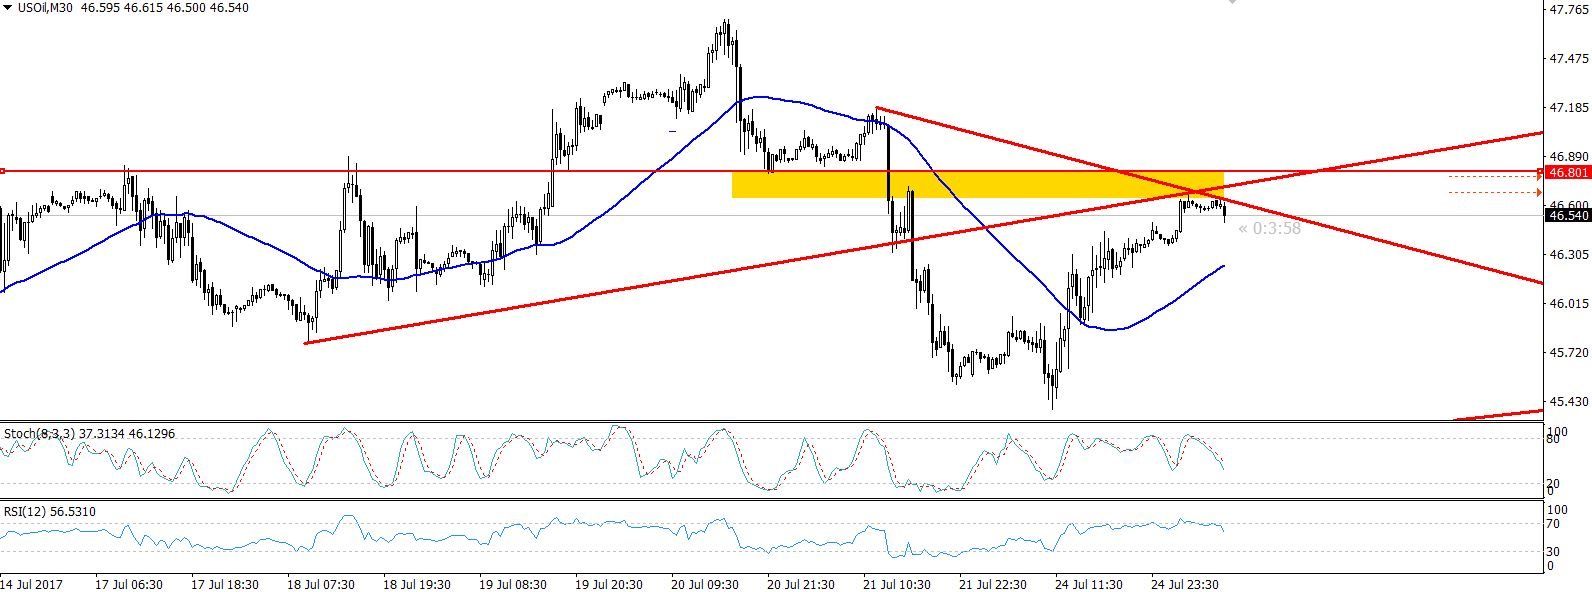 Crude Oil - 30 Mins Chart - Trendline Resistance